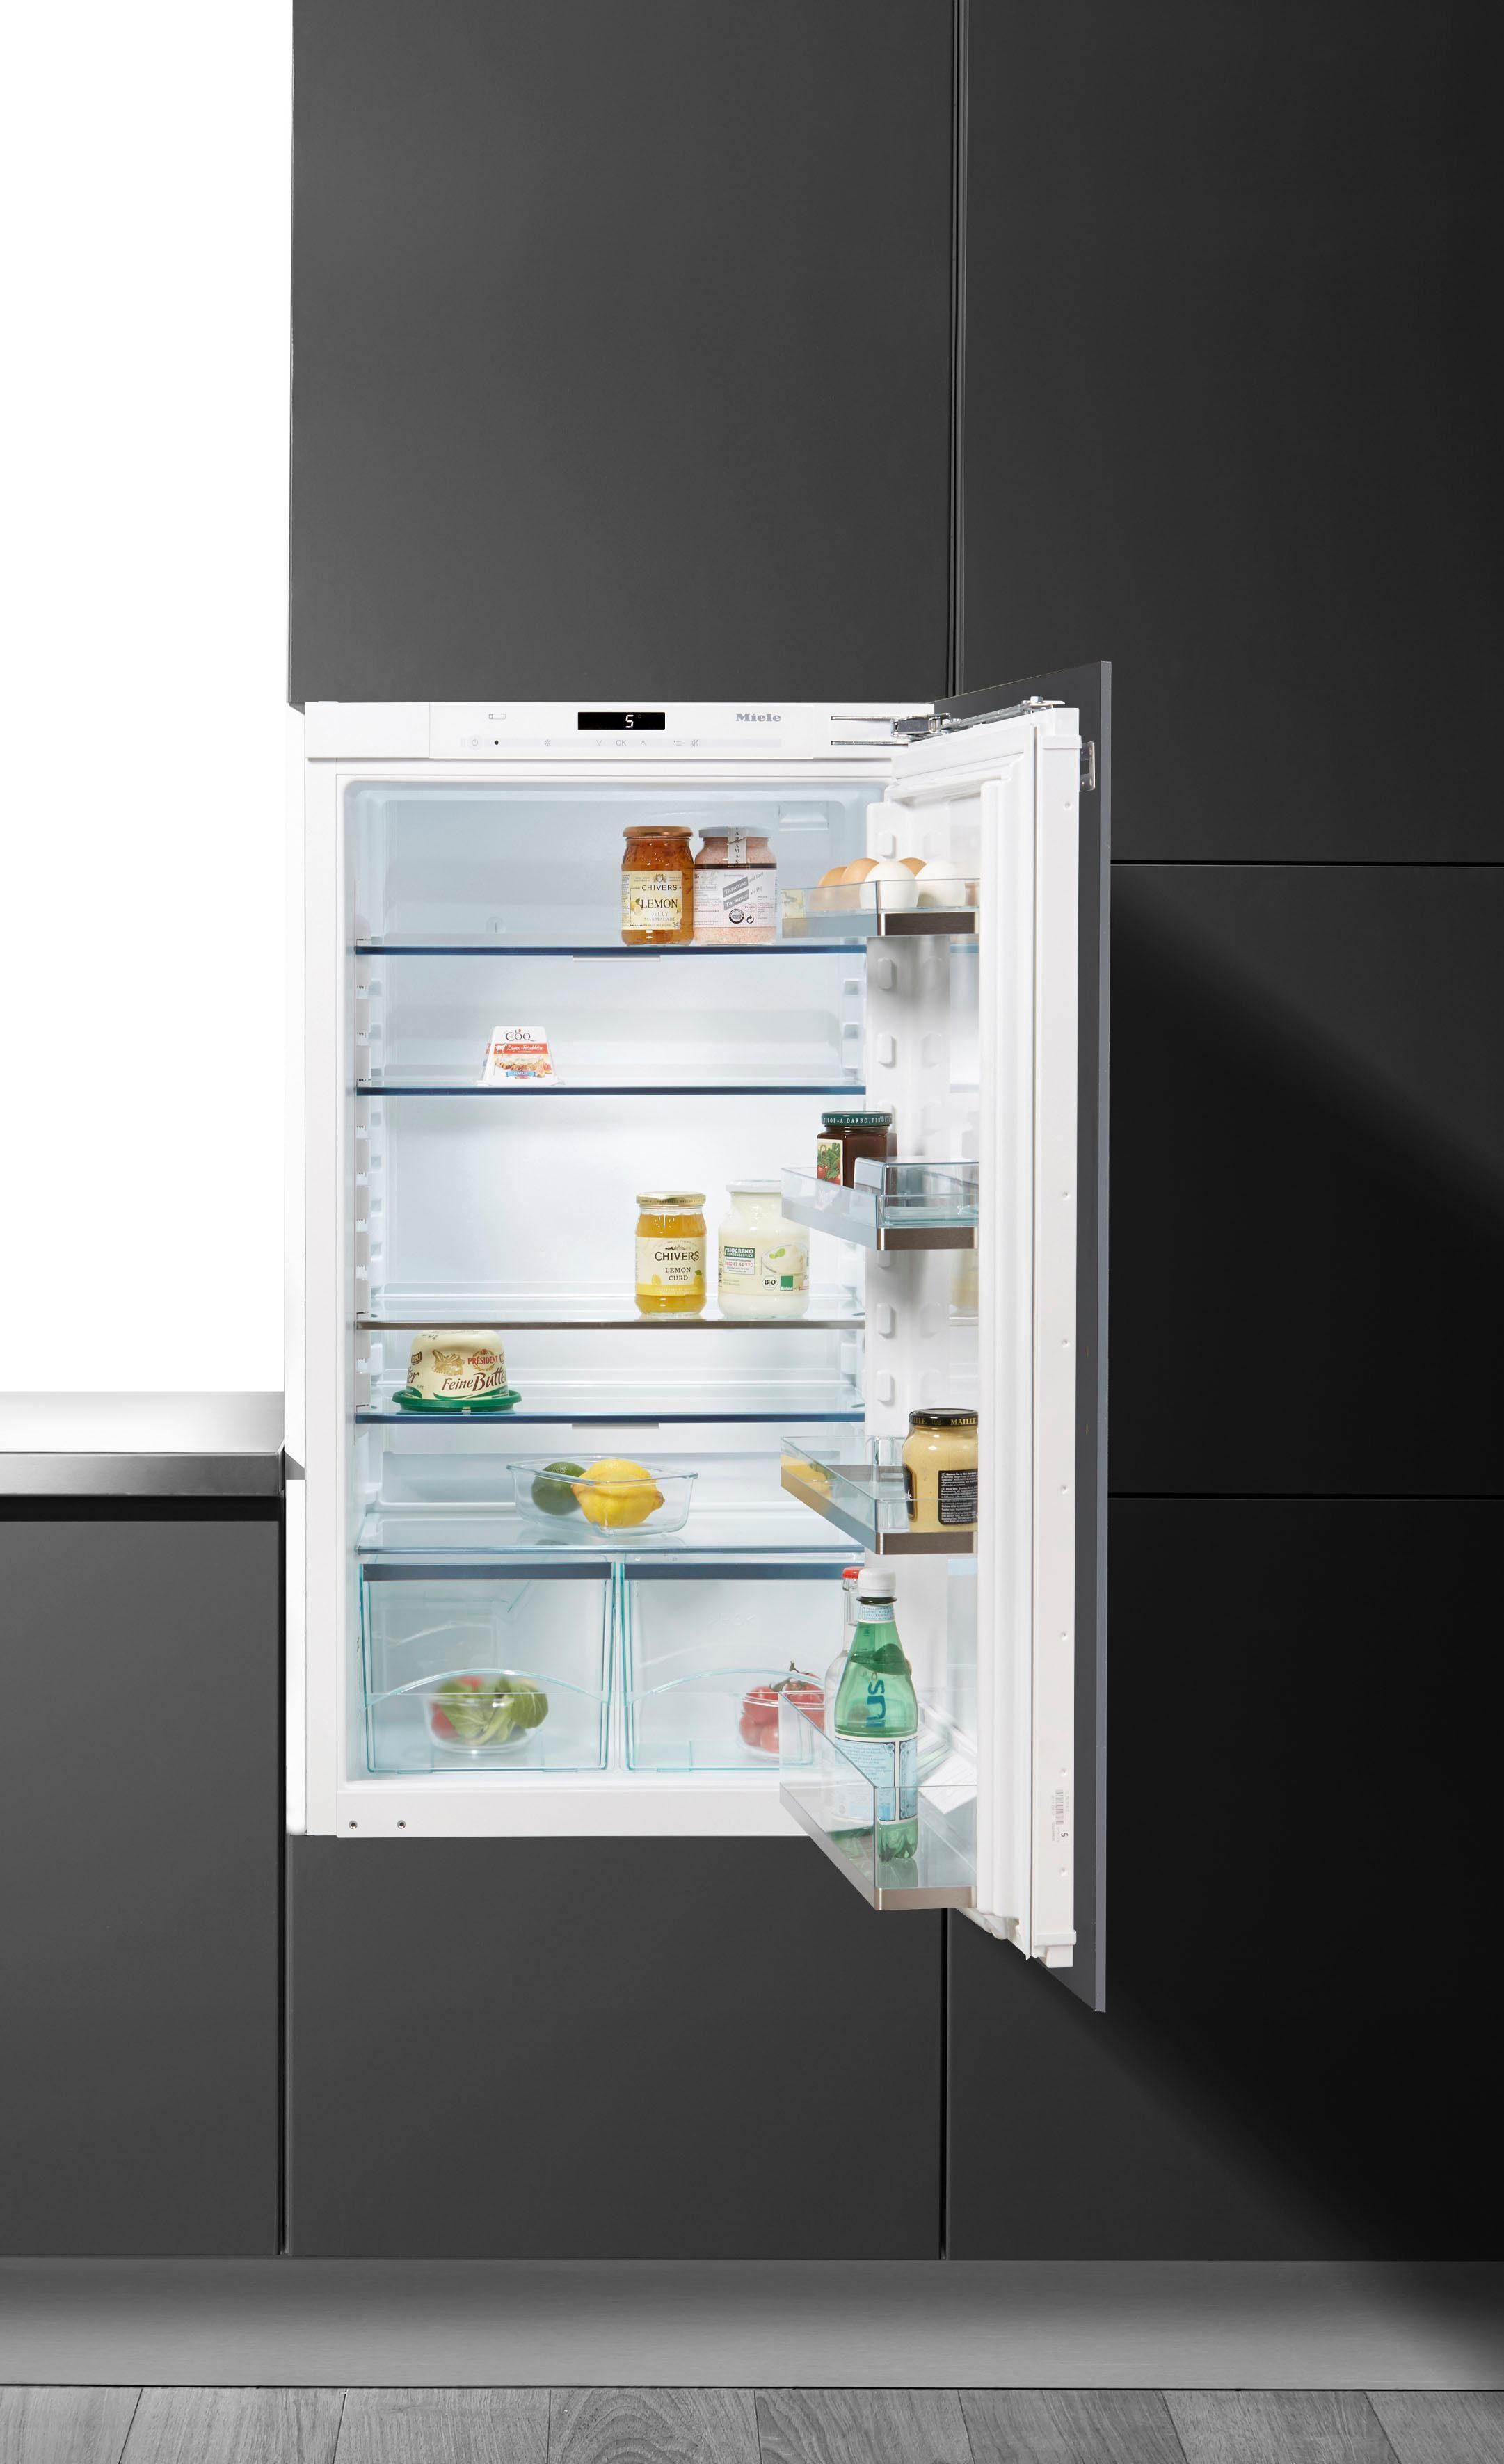 Miele Einbaukühlschrank K 33422 i, 102,2 cm hoch, 55,9 cm breit